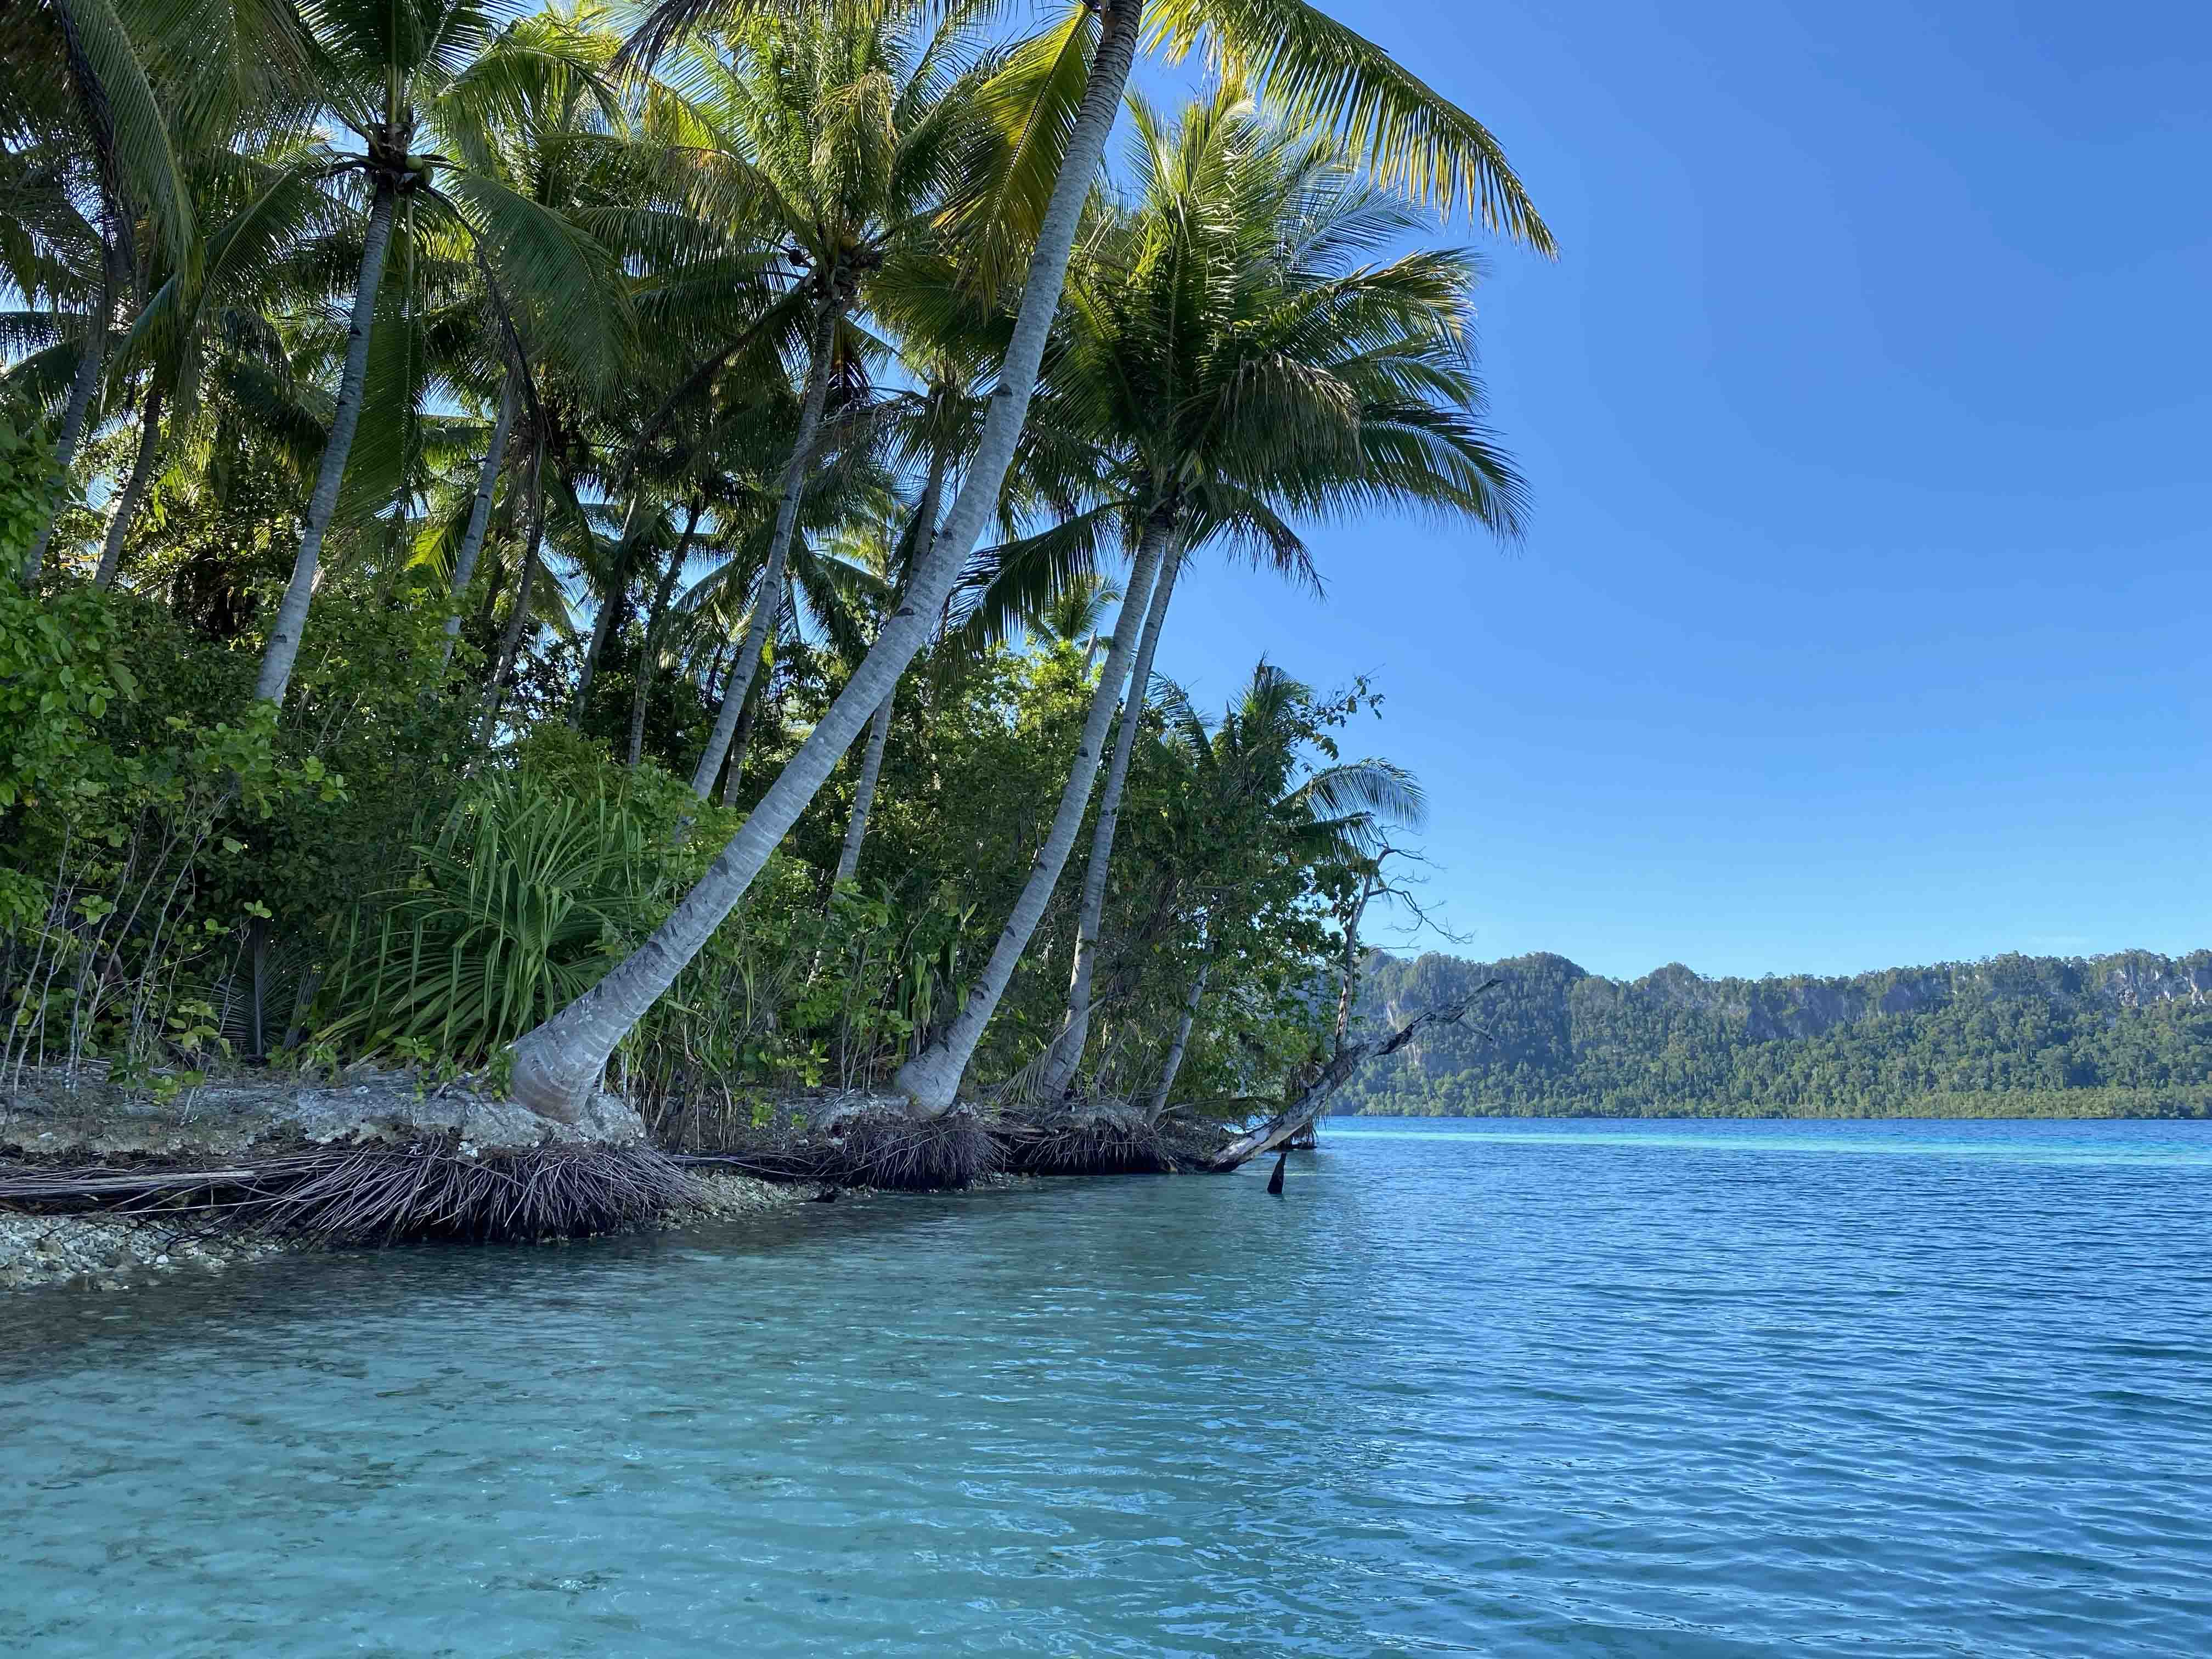 The Papua New Guinea coastline